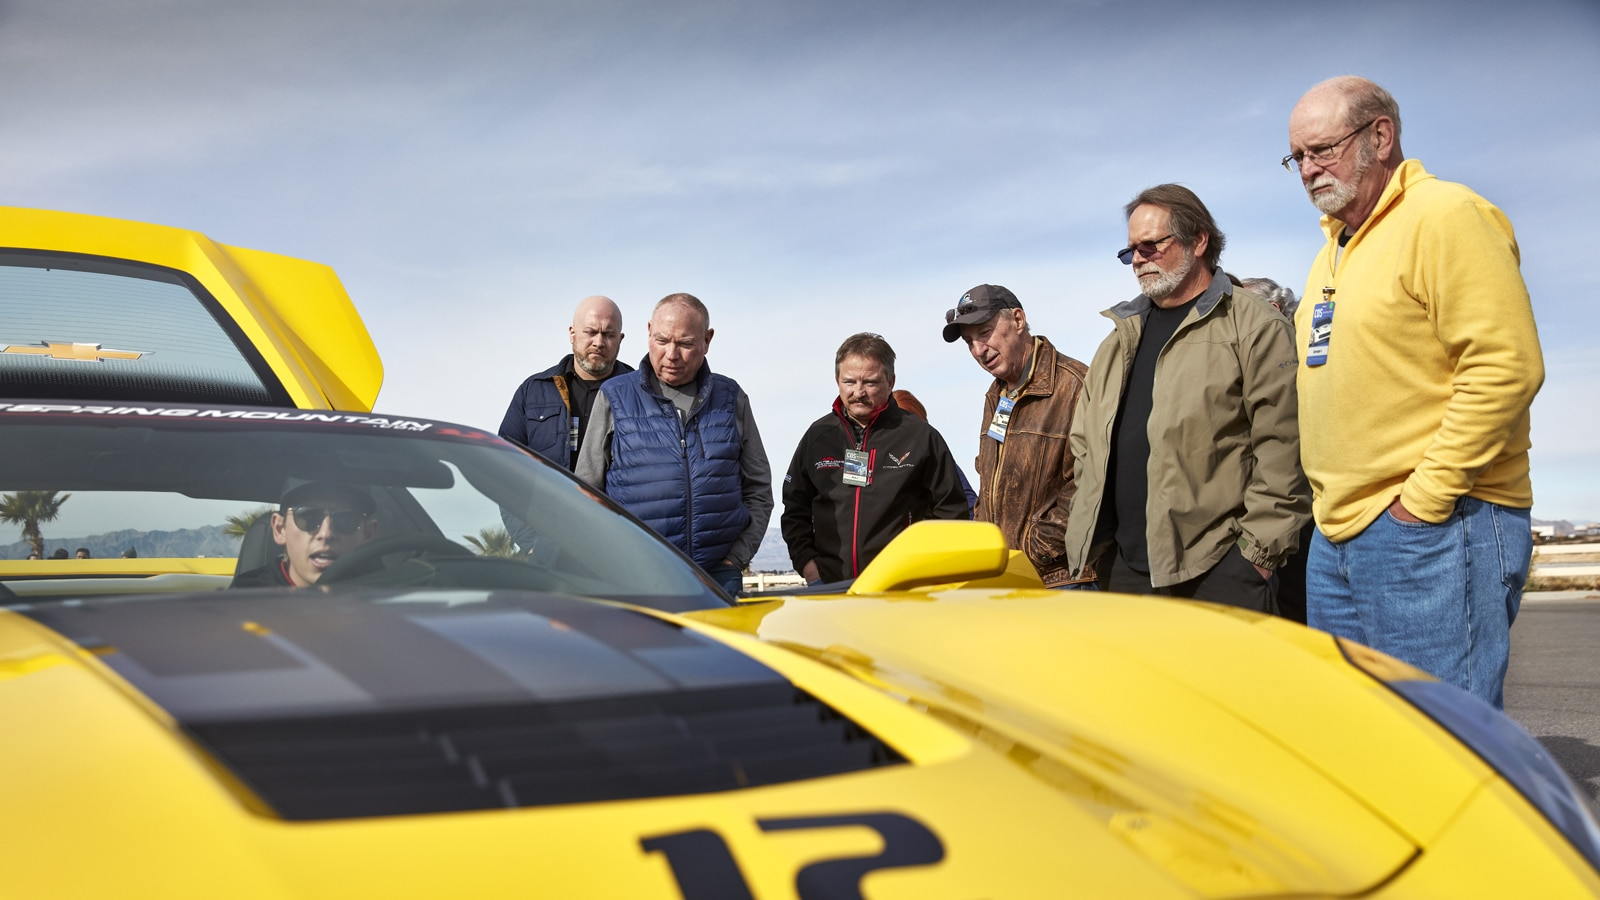 Estudiantes admirando un Corvette amarillo.